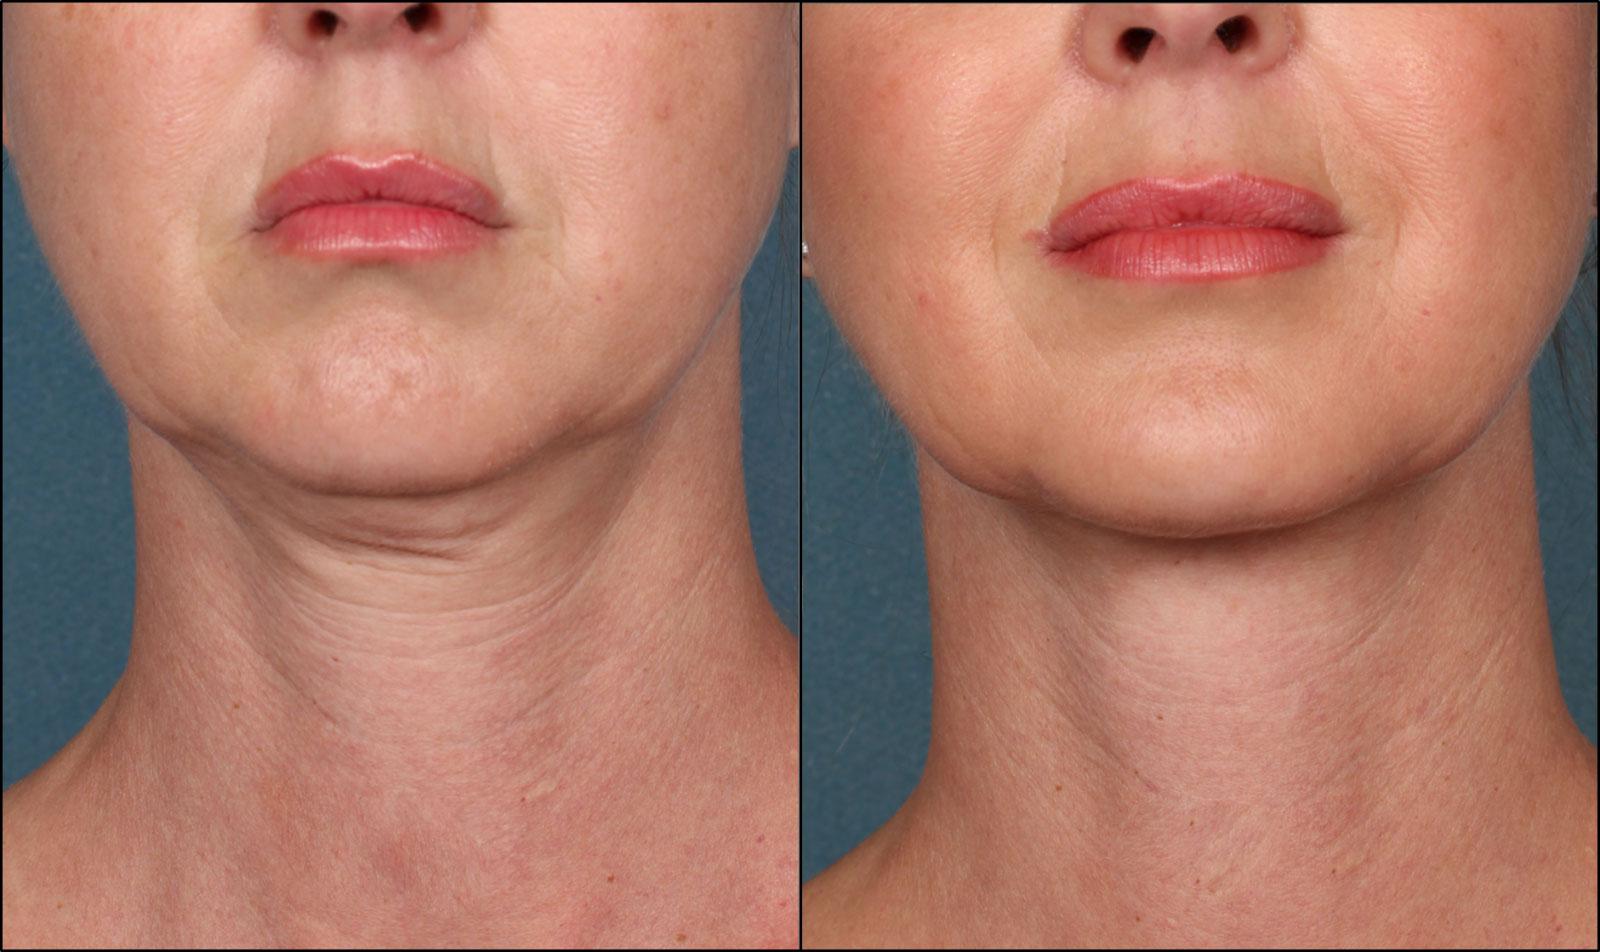 8 Benefits of Non-Surgical Skin Tightening Procedures